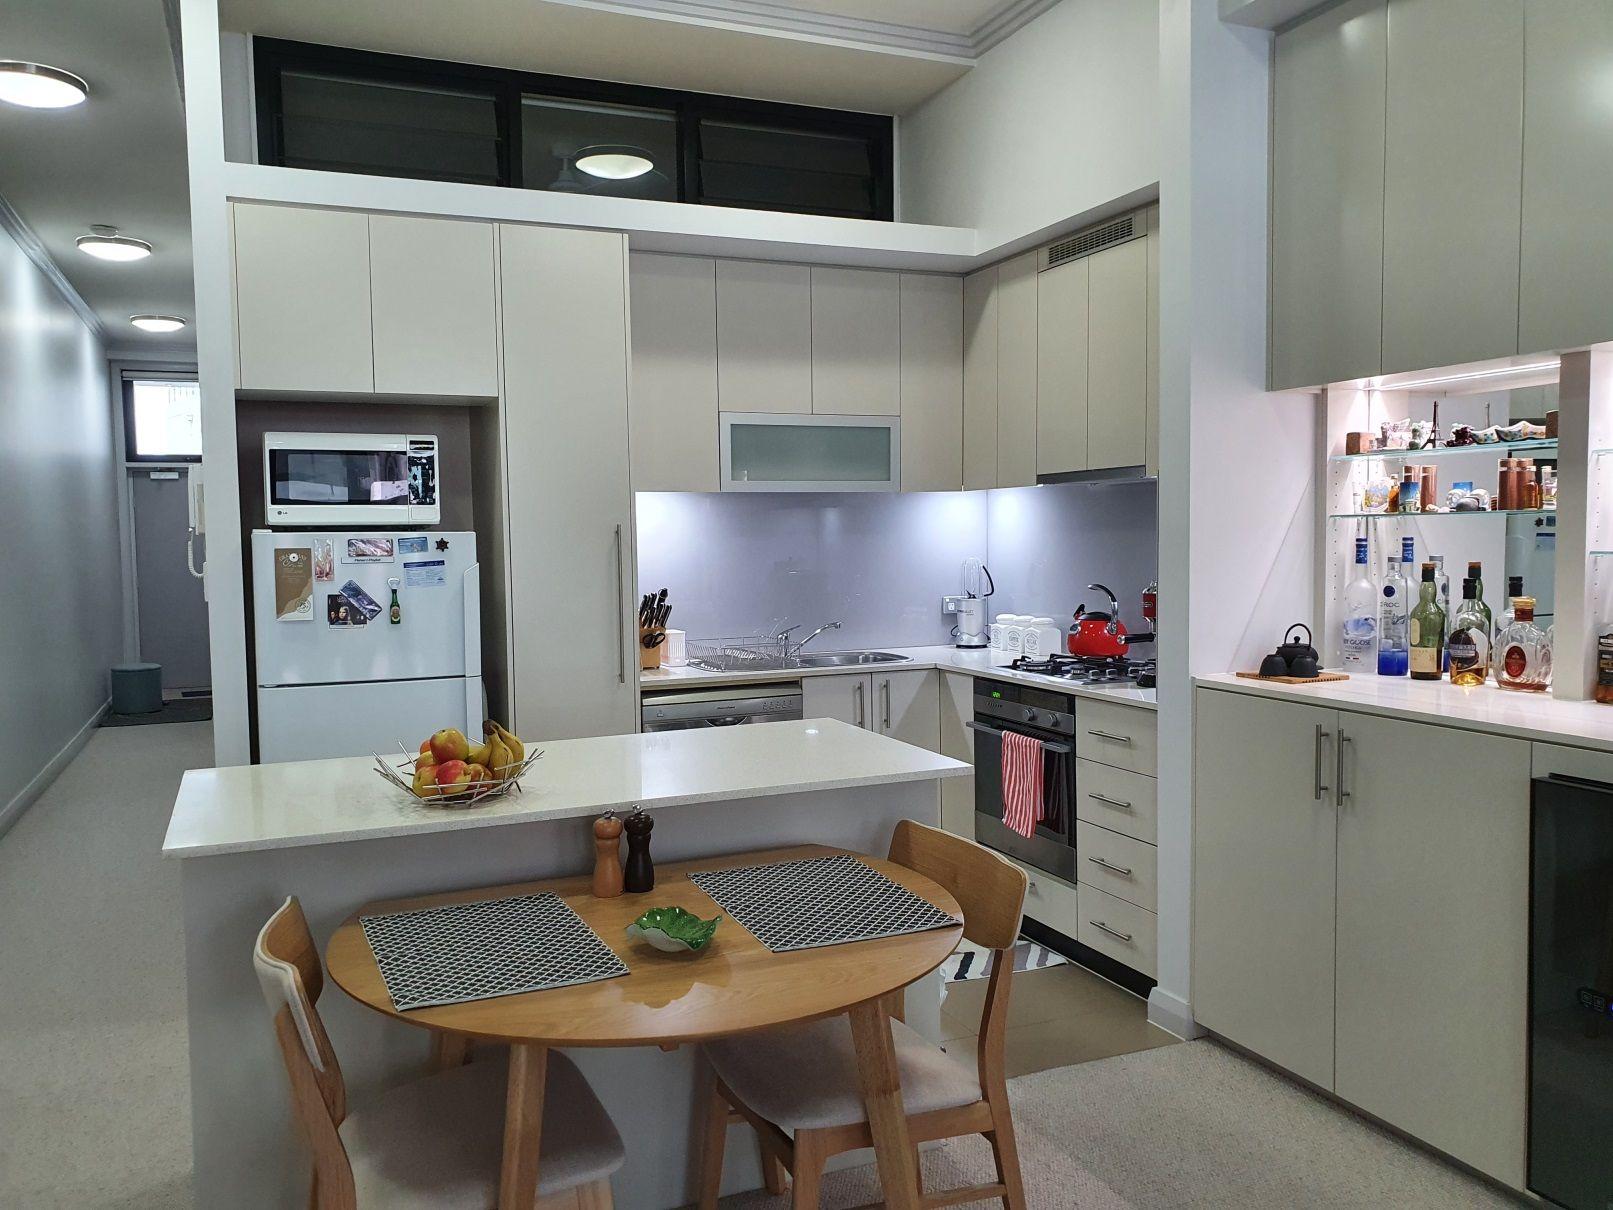 79/2 Underdale Lane, Meadowbank NSW 2114